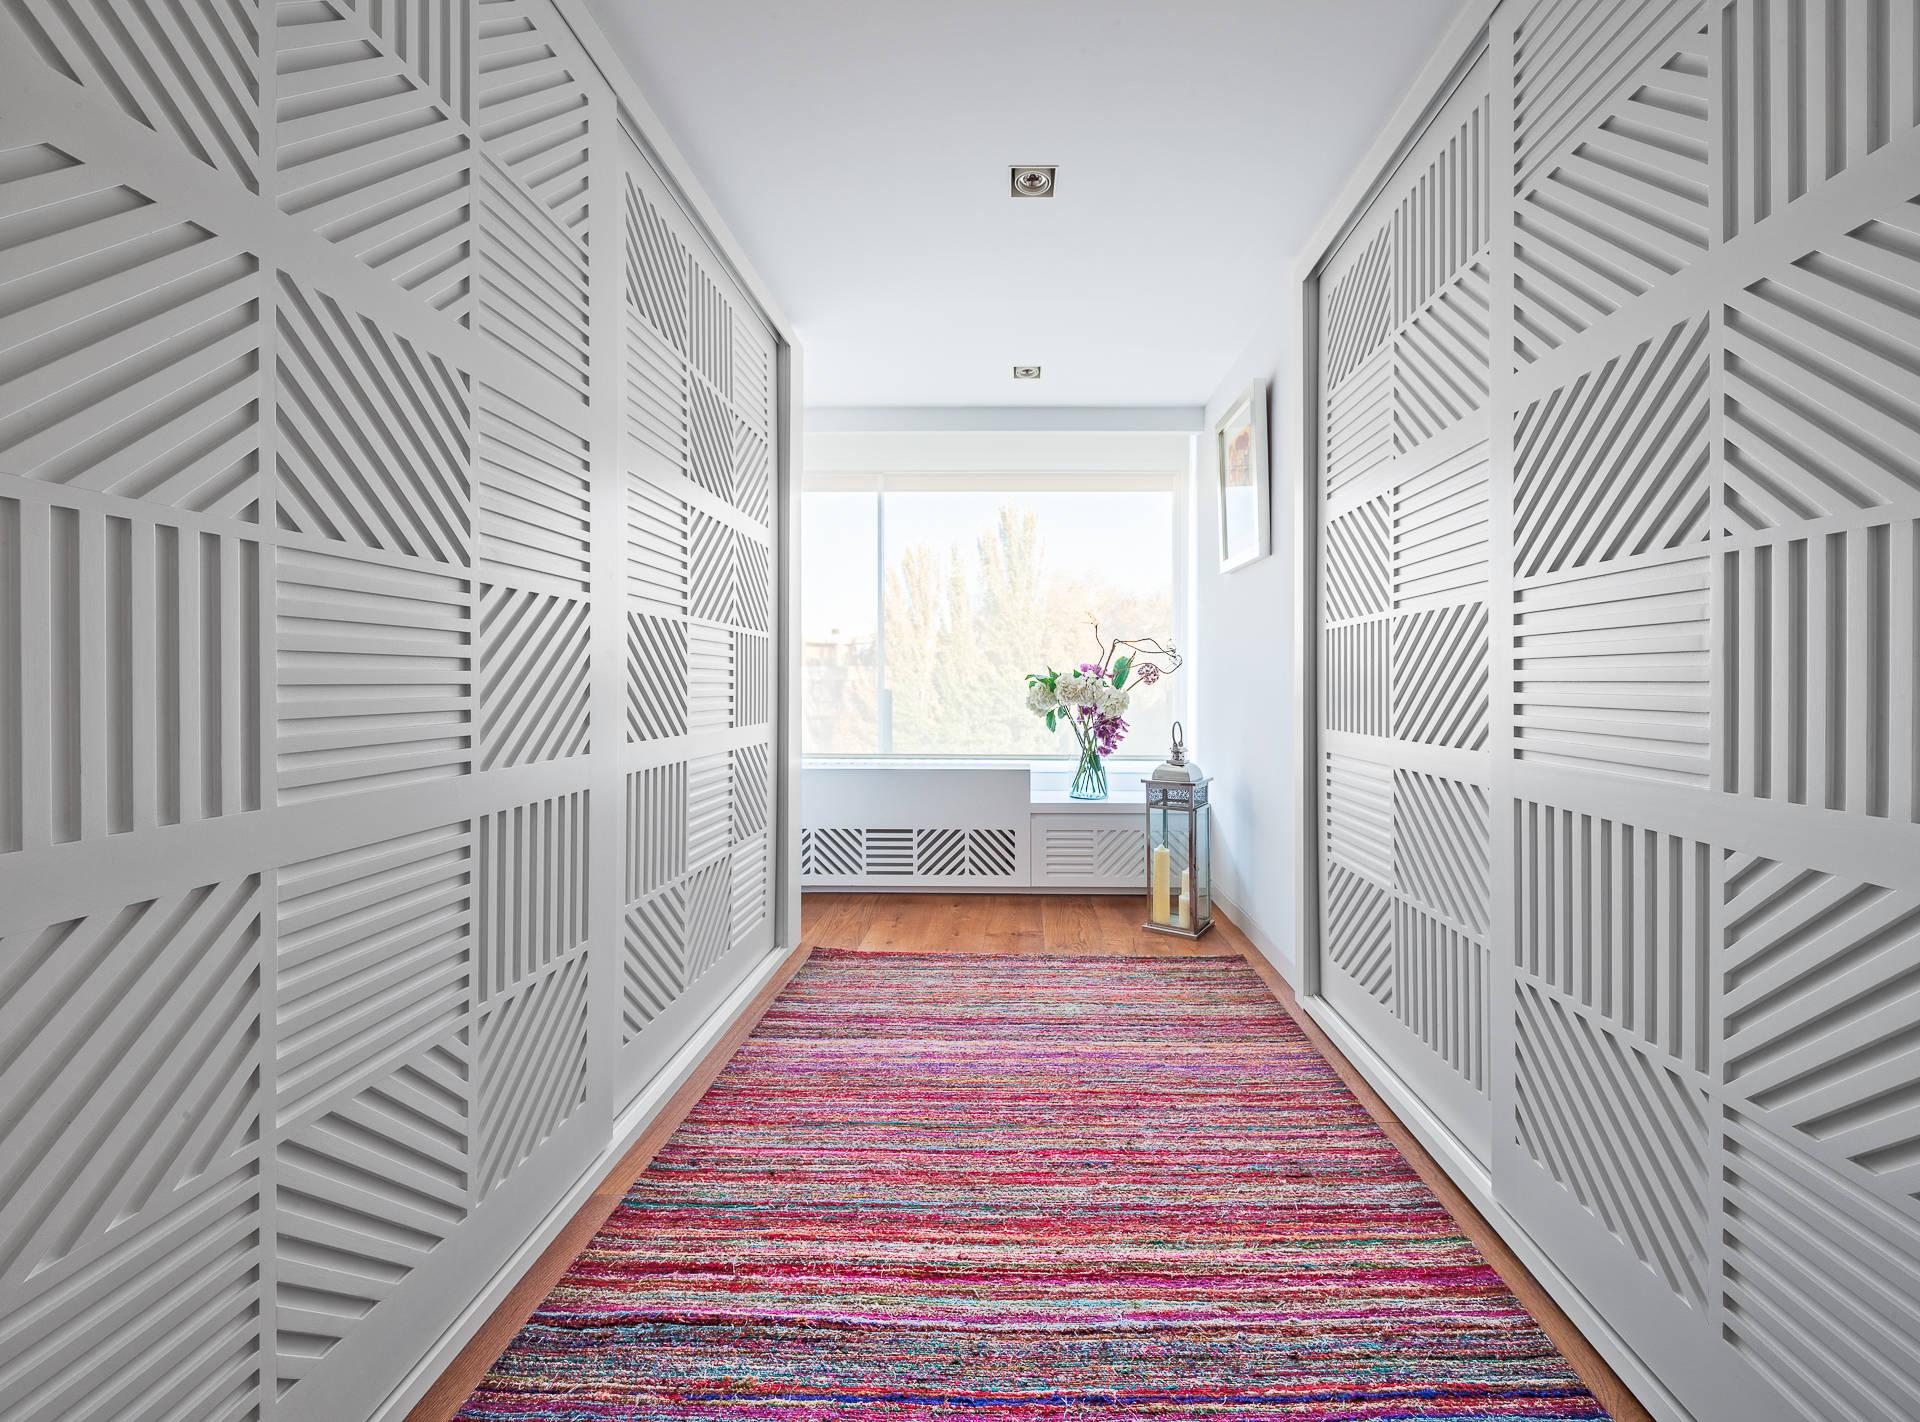 decoración con alfombras en pasillo